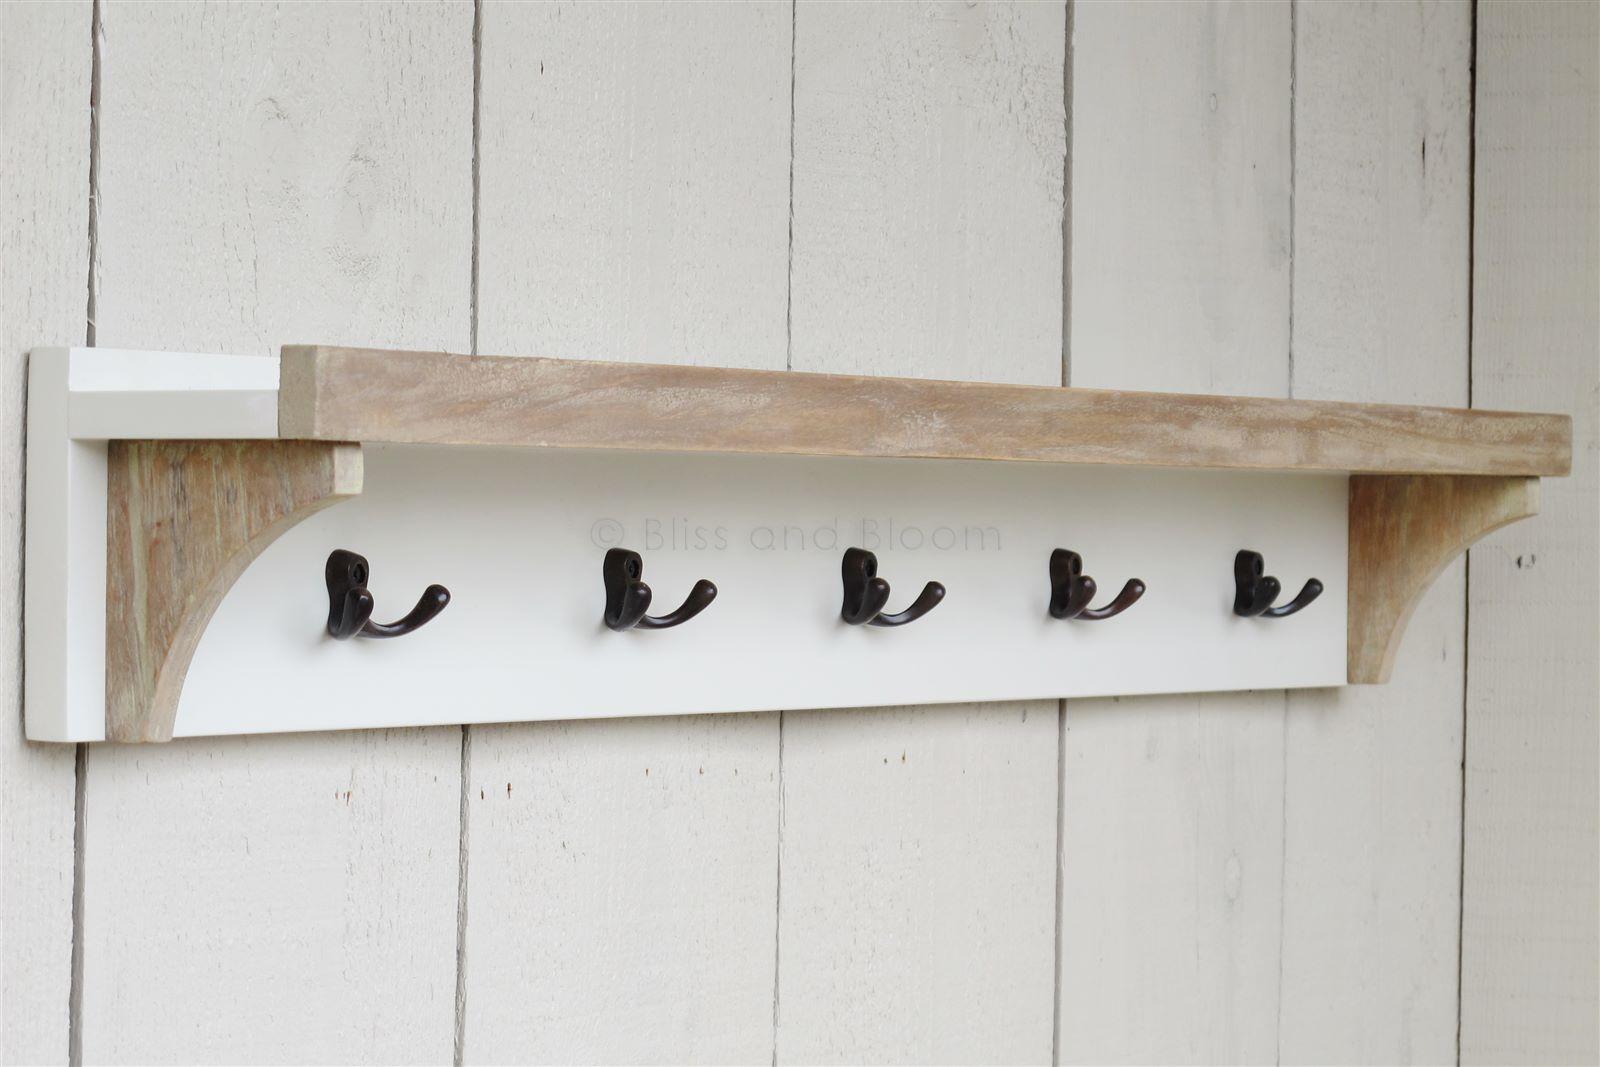 Antique white shelf 5 coat hooks